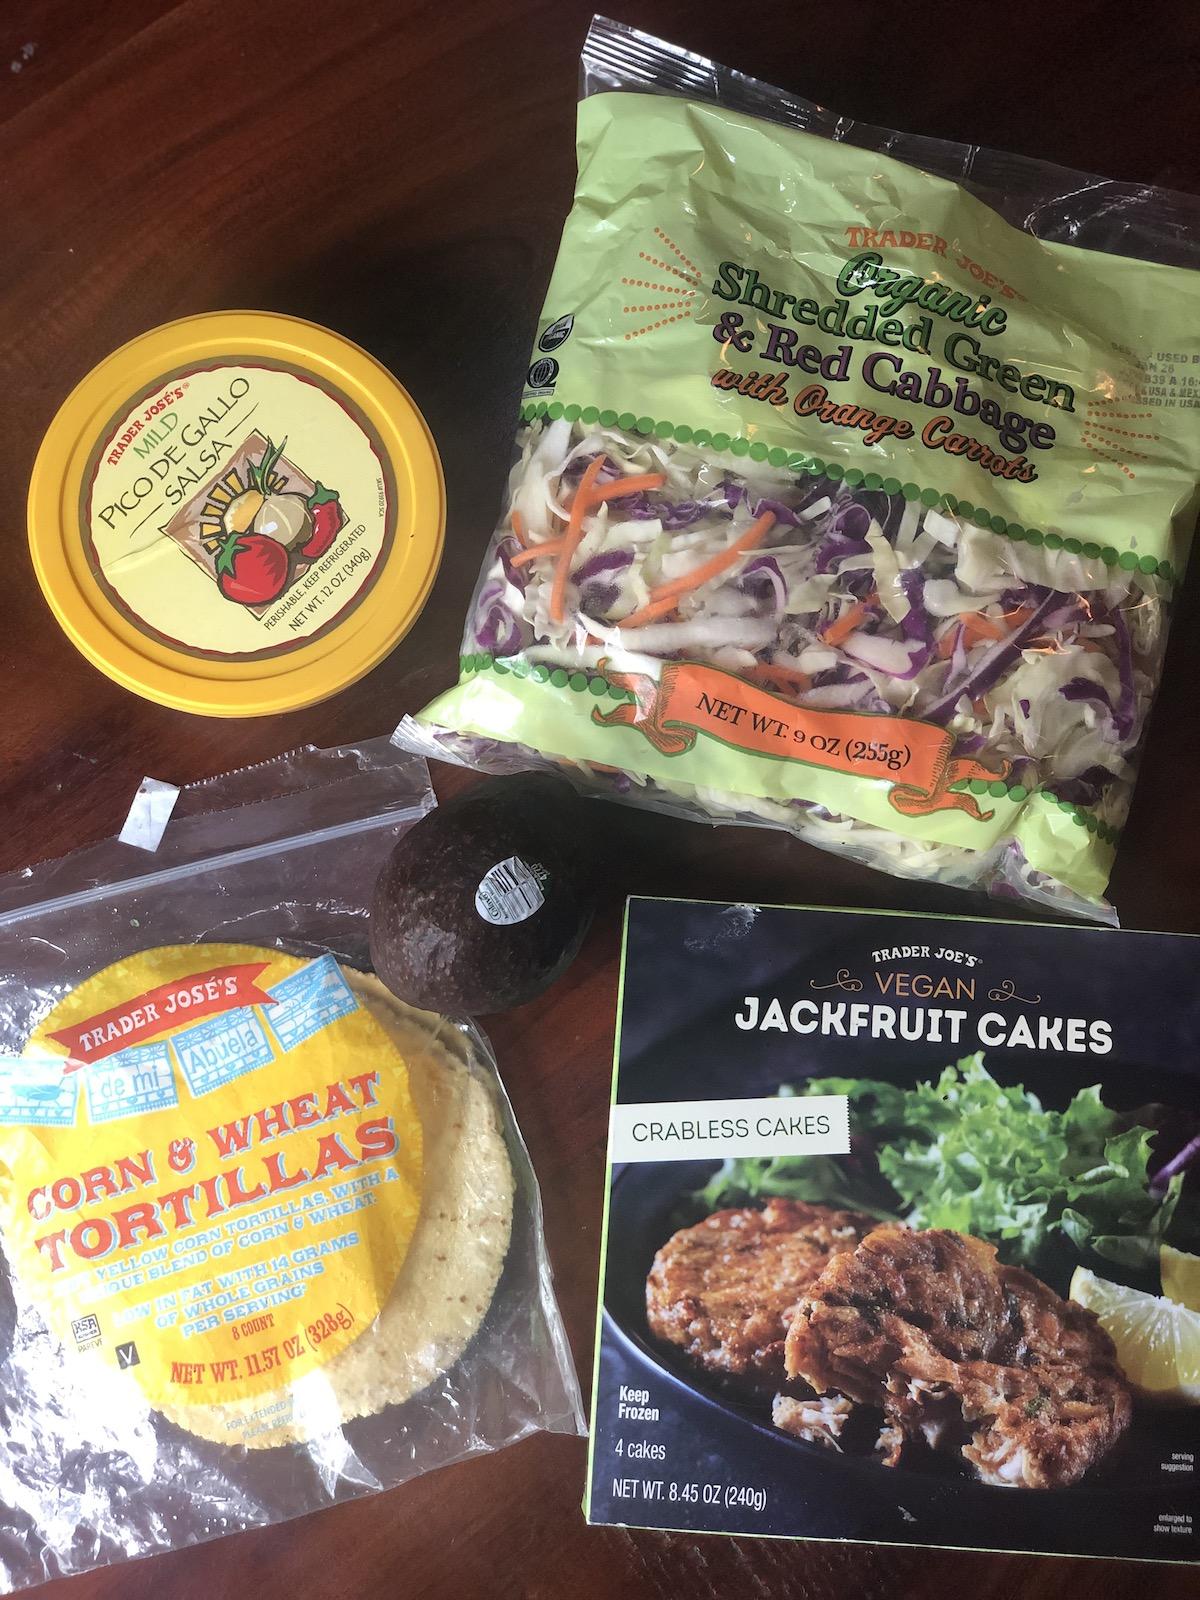 Trader Joe's Jackfruit Tacos Ingredients.jpg